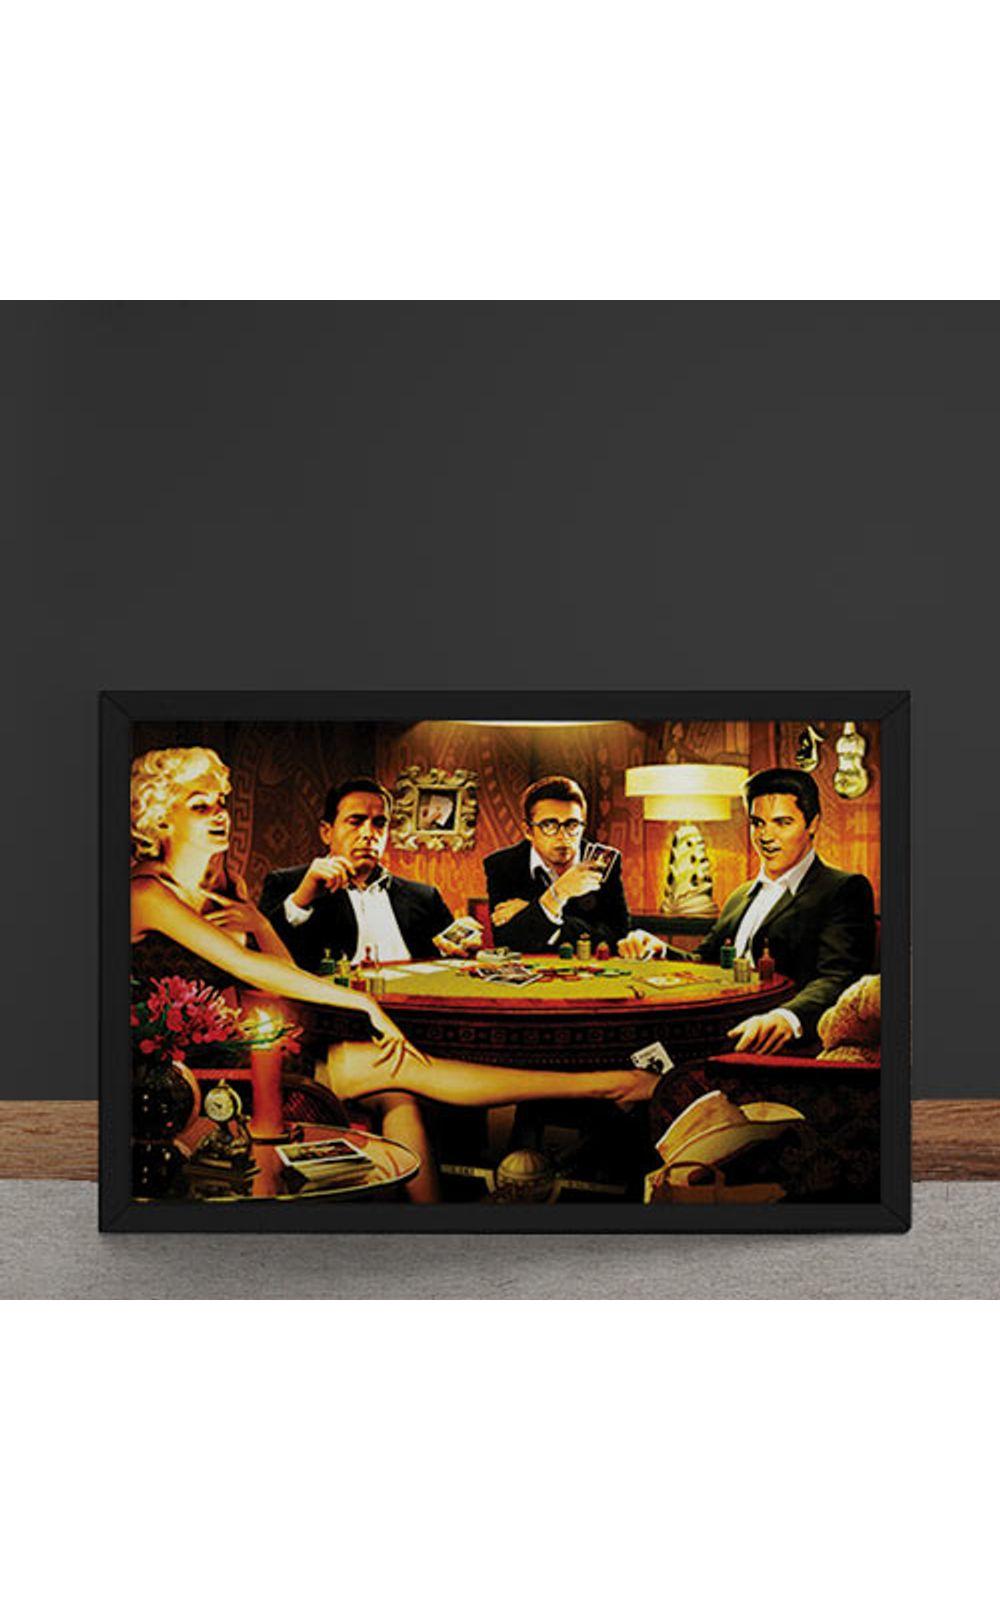 Foto 4 - Quadro Decorativo Baralho Marilyn Monroes Elvis Presley James Dean Humphrey Bogart